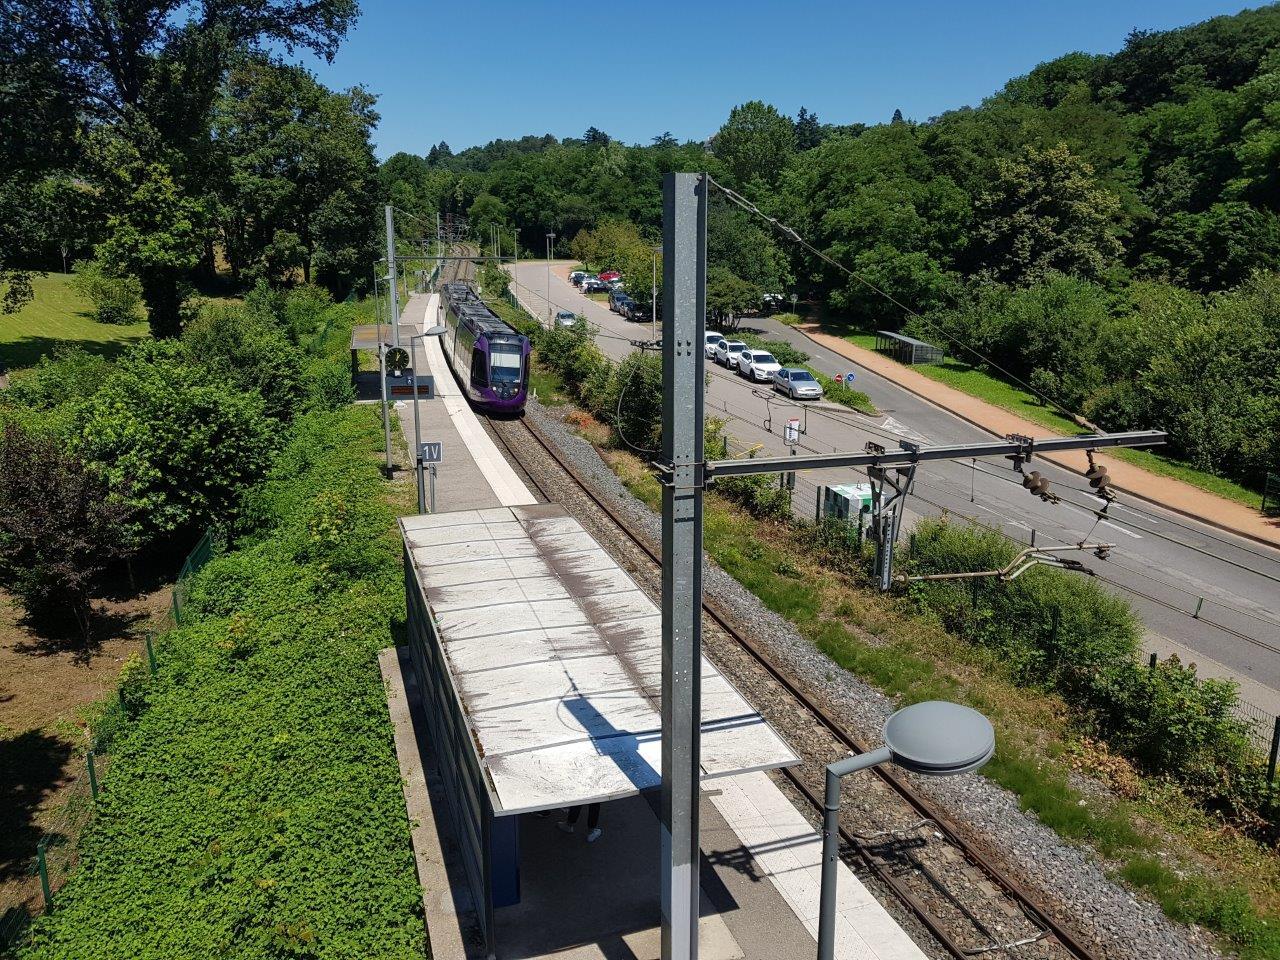 gare-du-meridien-train-station